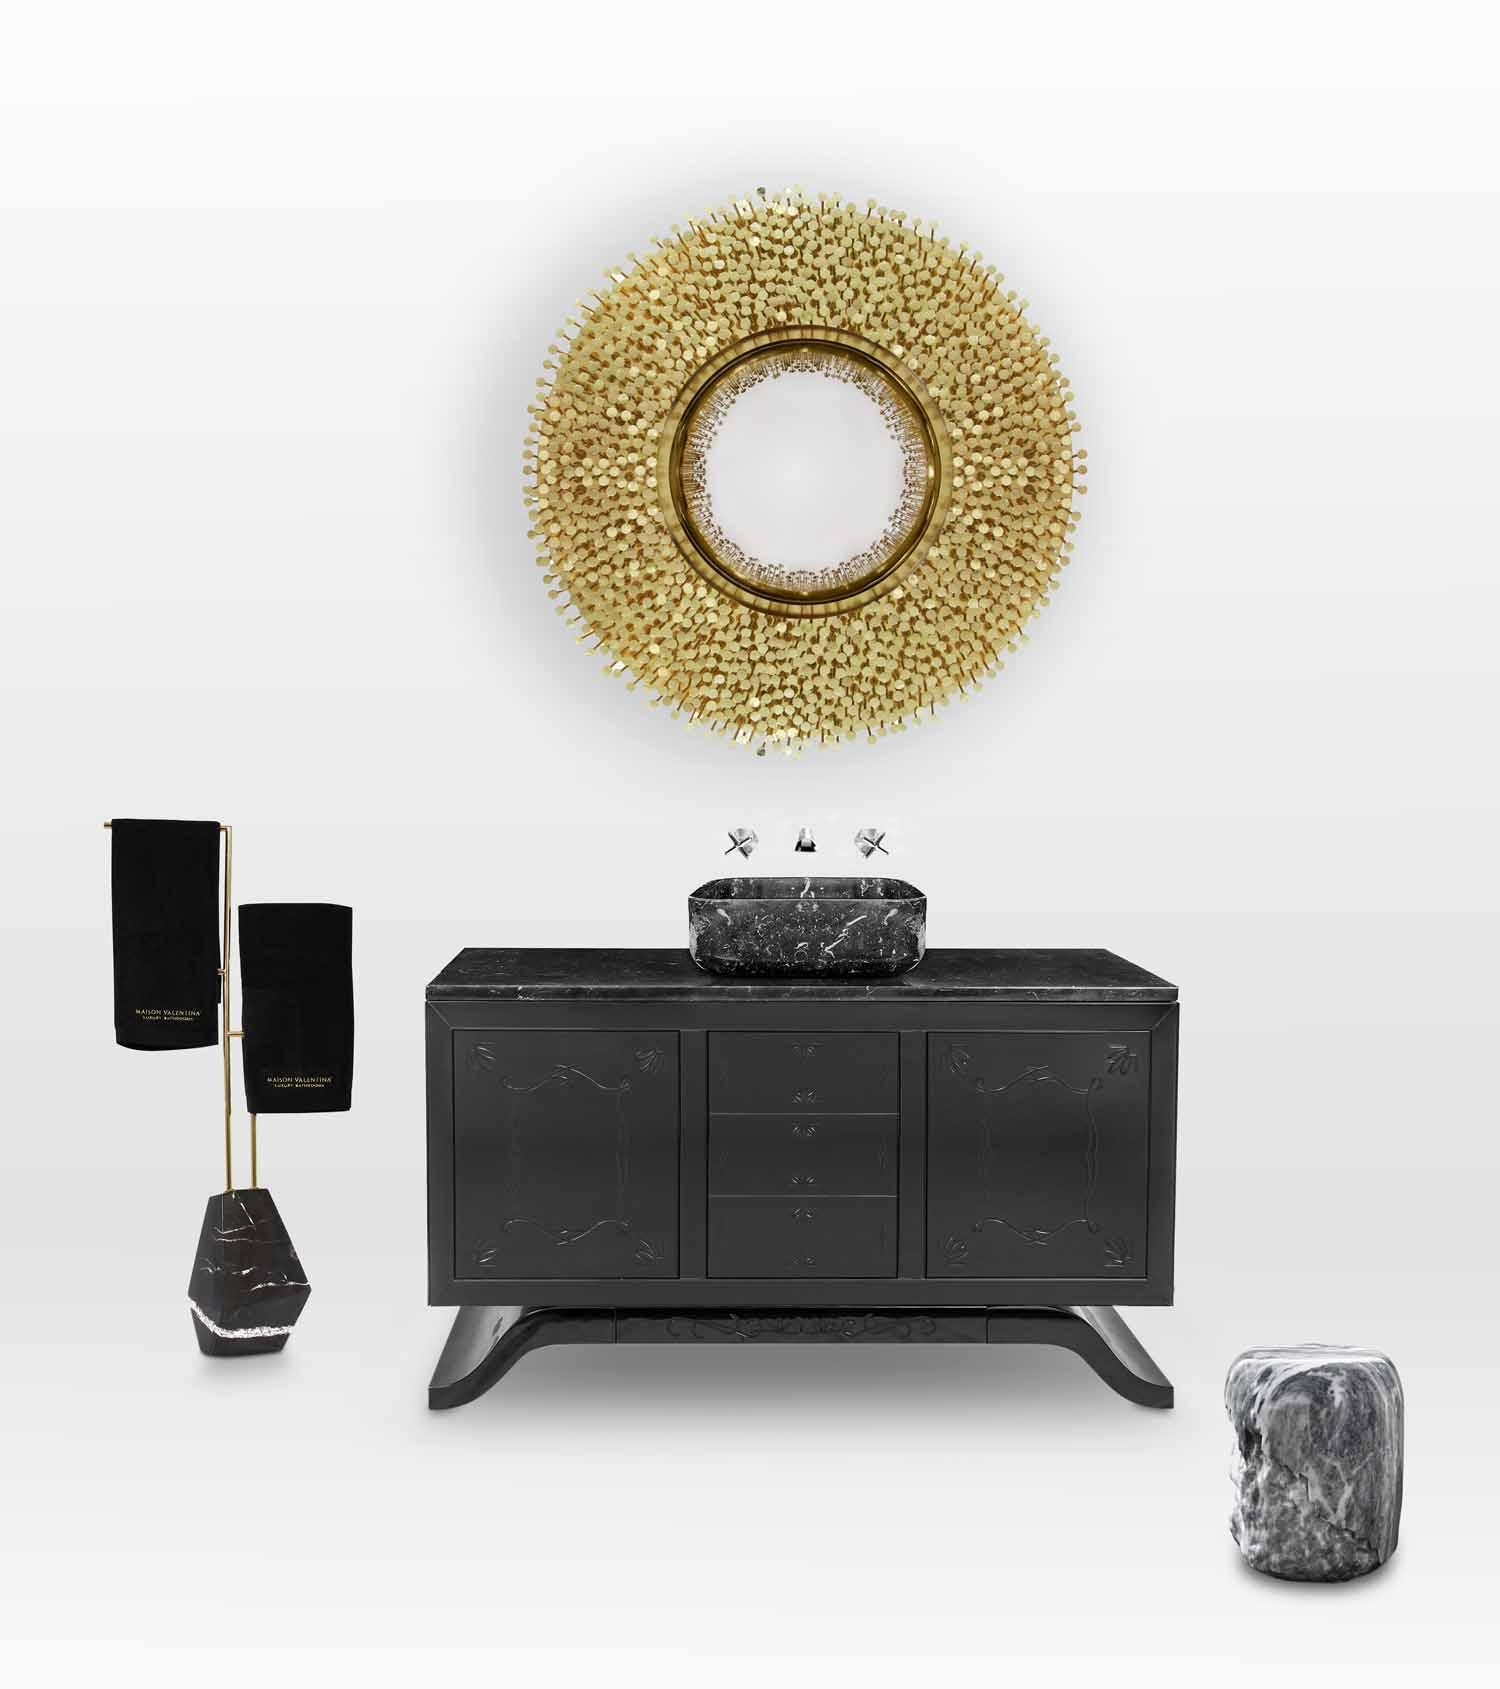 metropolitan-washbasin-diamond-towel-tack-yoho-stool-1-HR